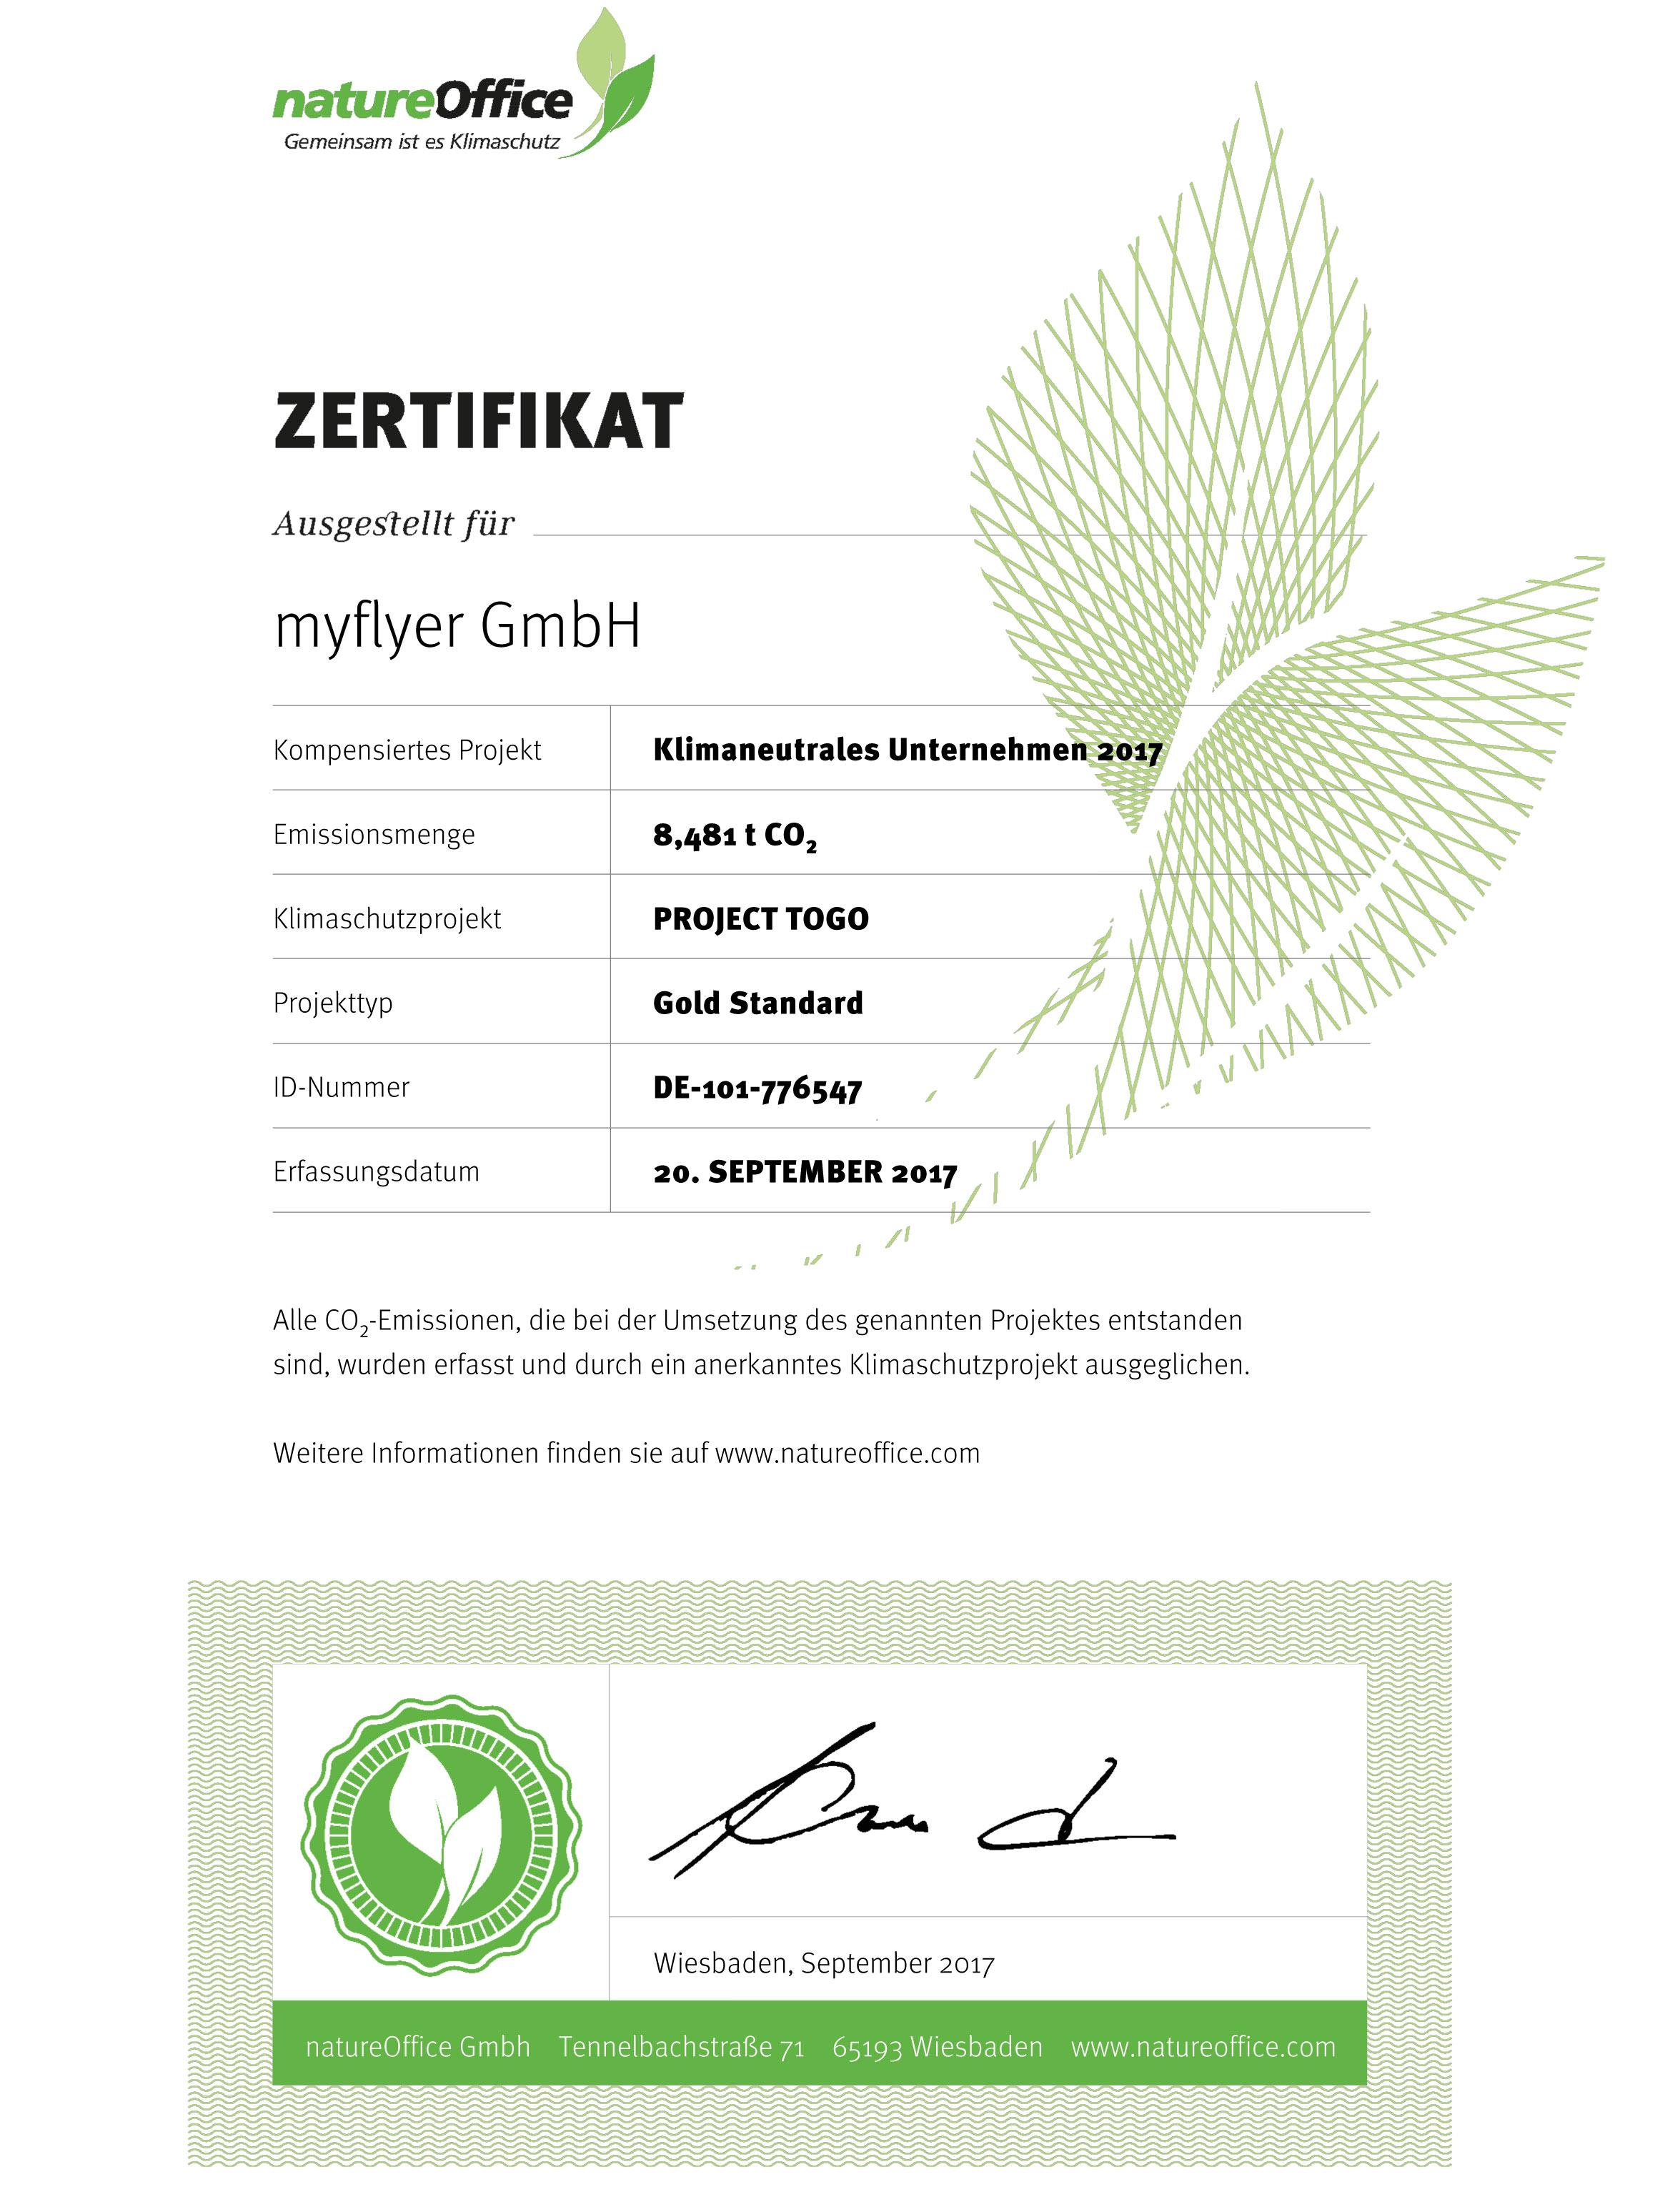 Zertifikat von natureoffice.com